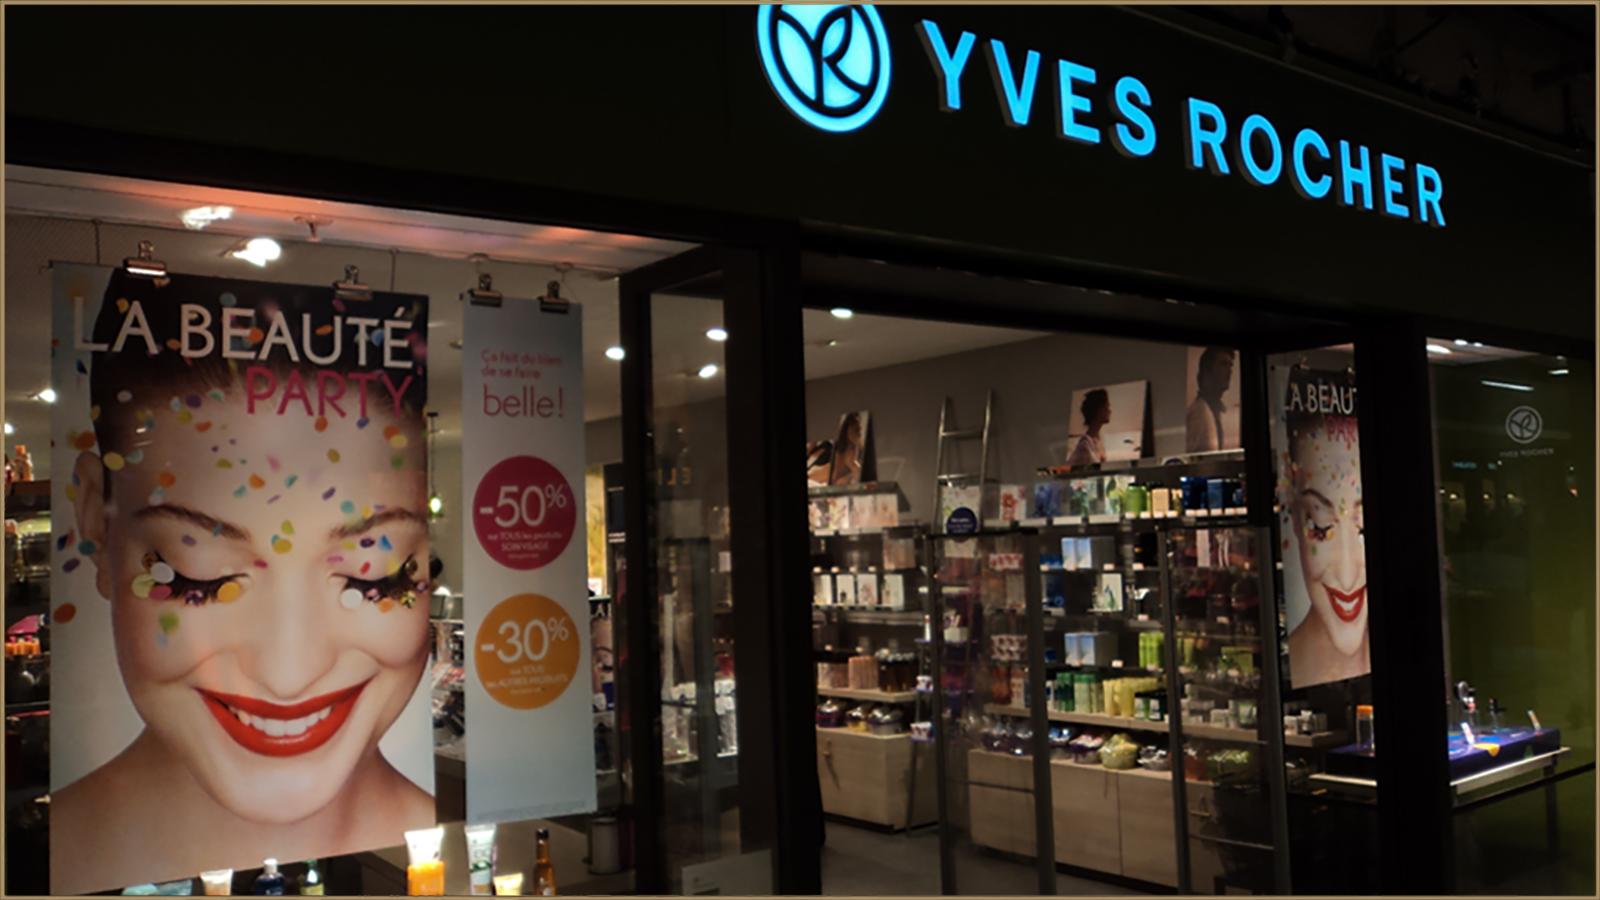 Iyves Rocher Storefront